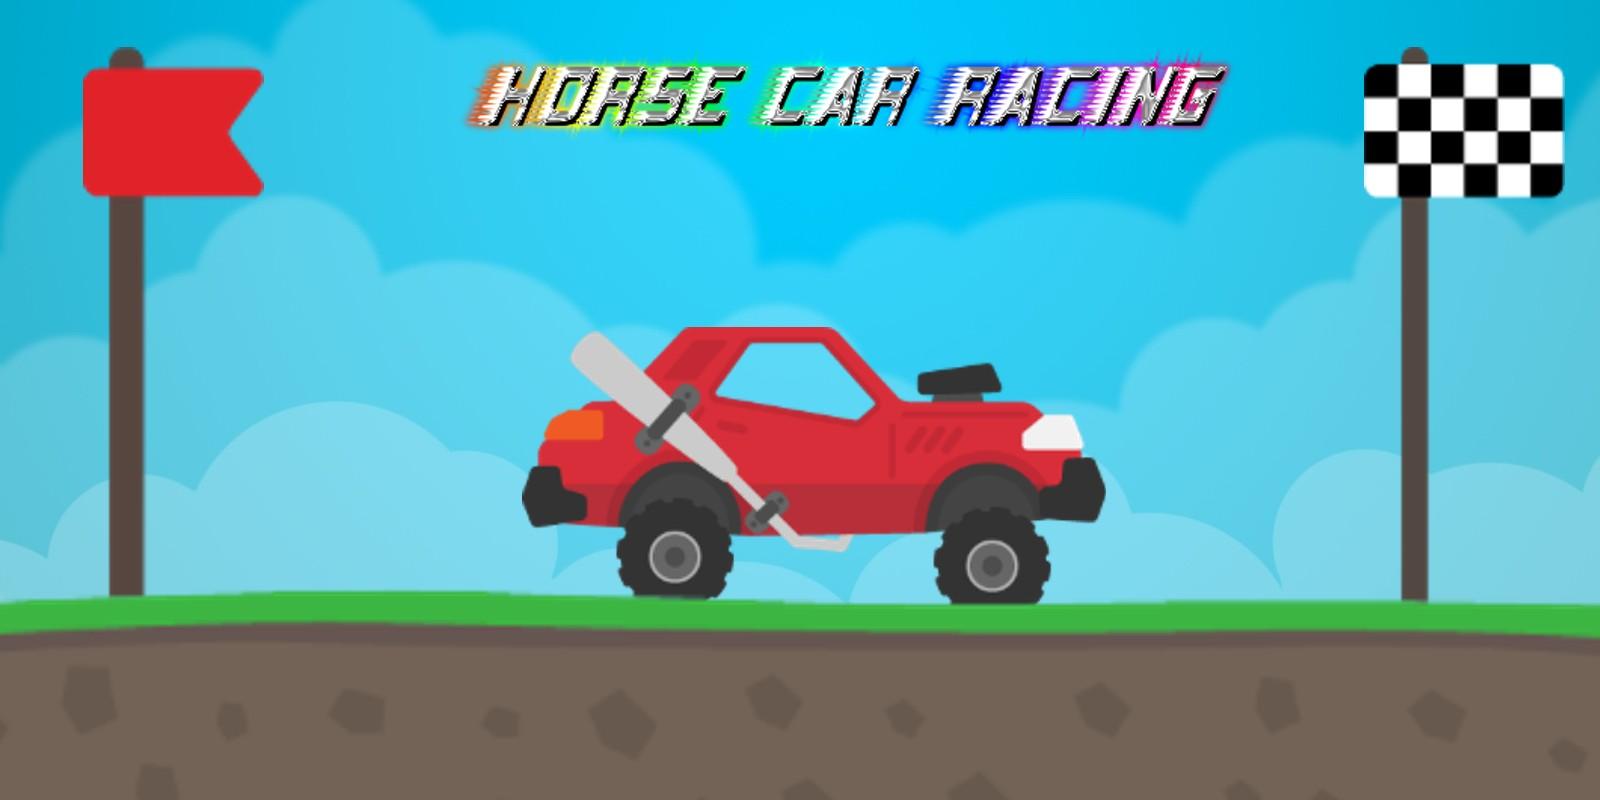 Horse Car Racing - Full Buildbox Project